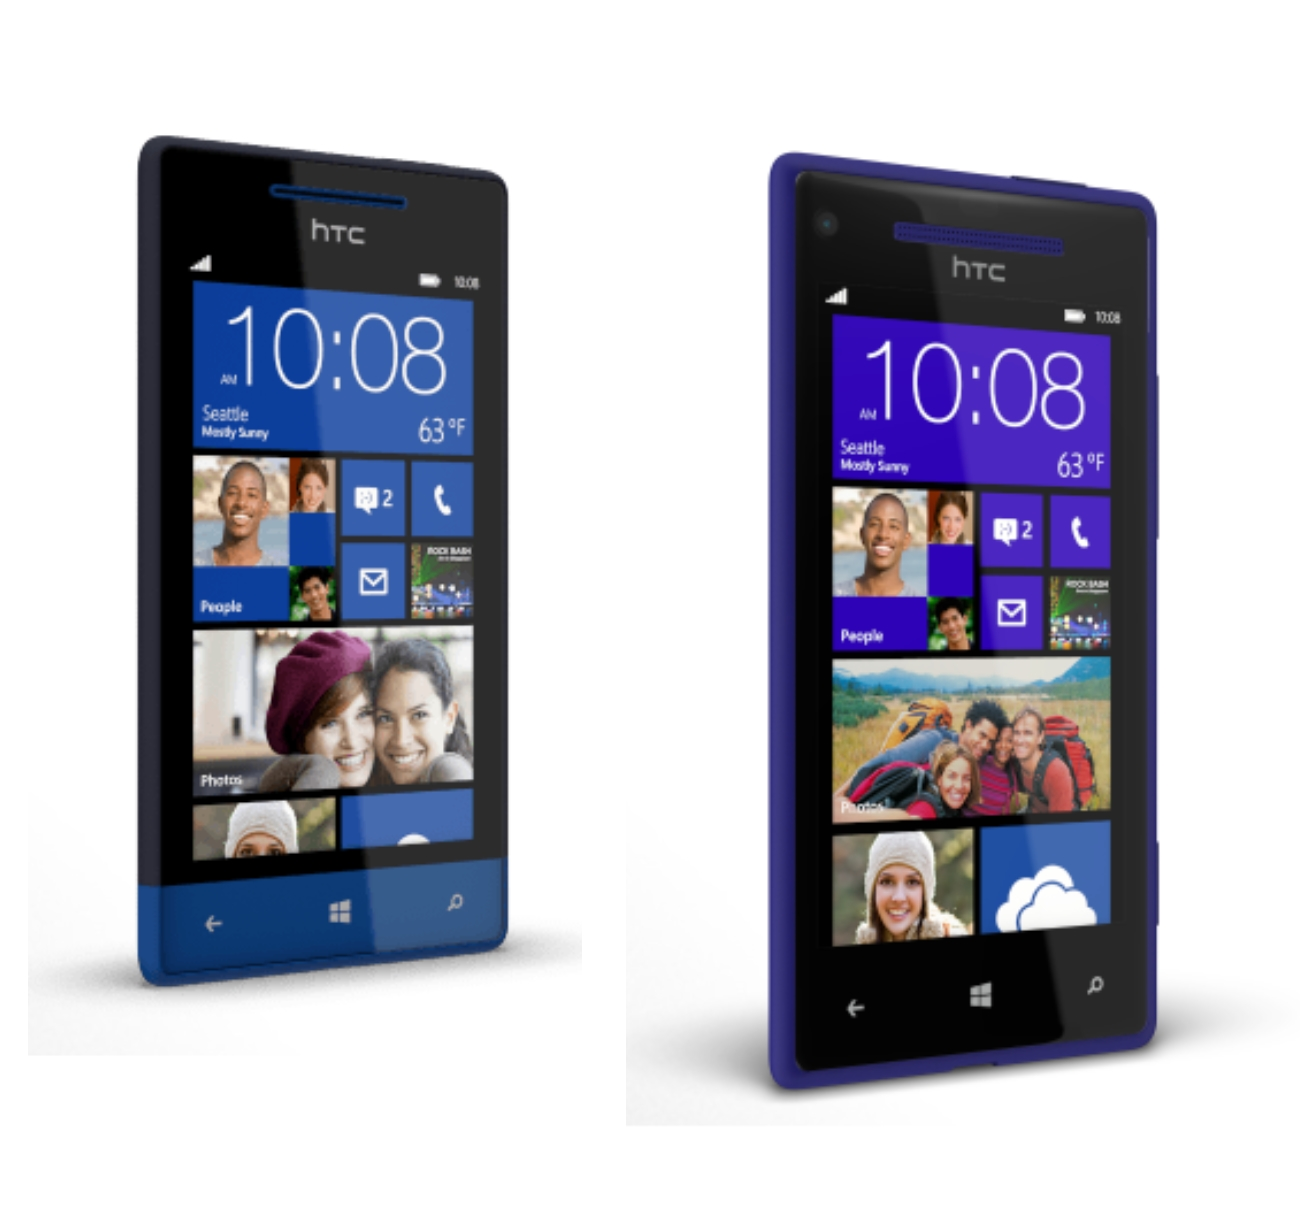 HTC 8S-HTC 8X